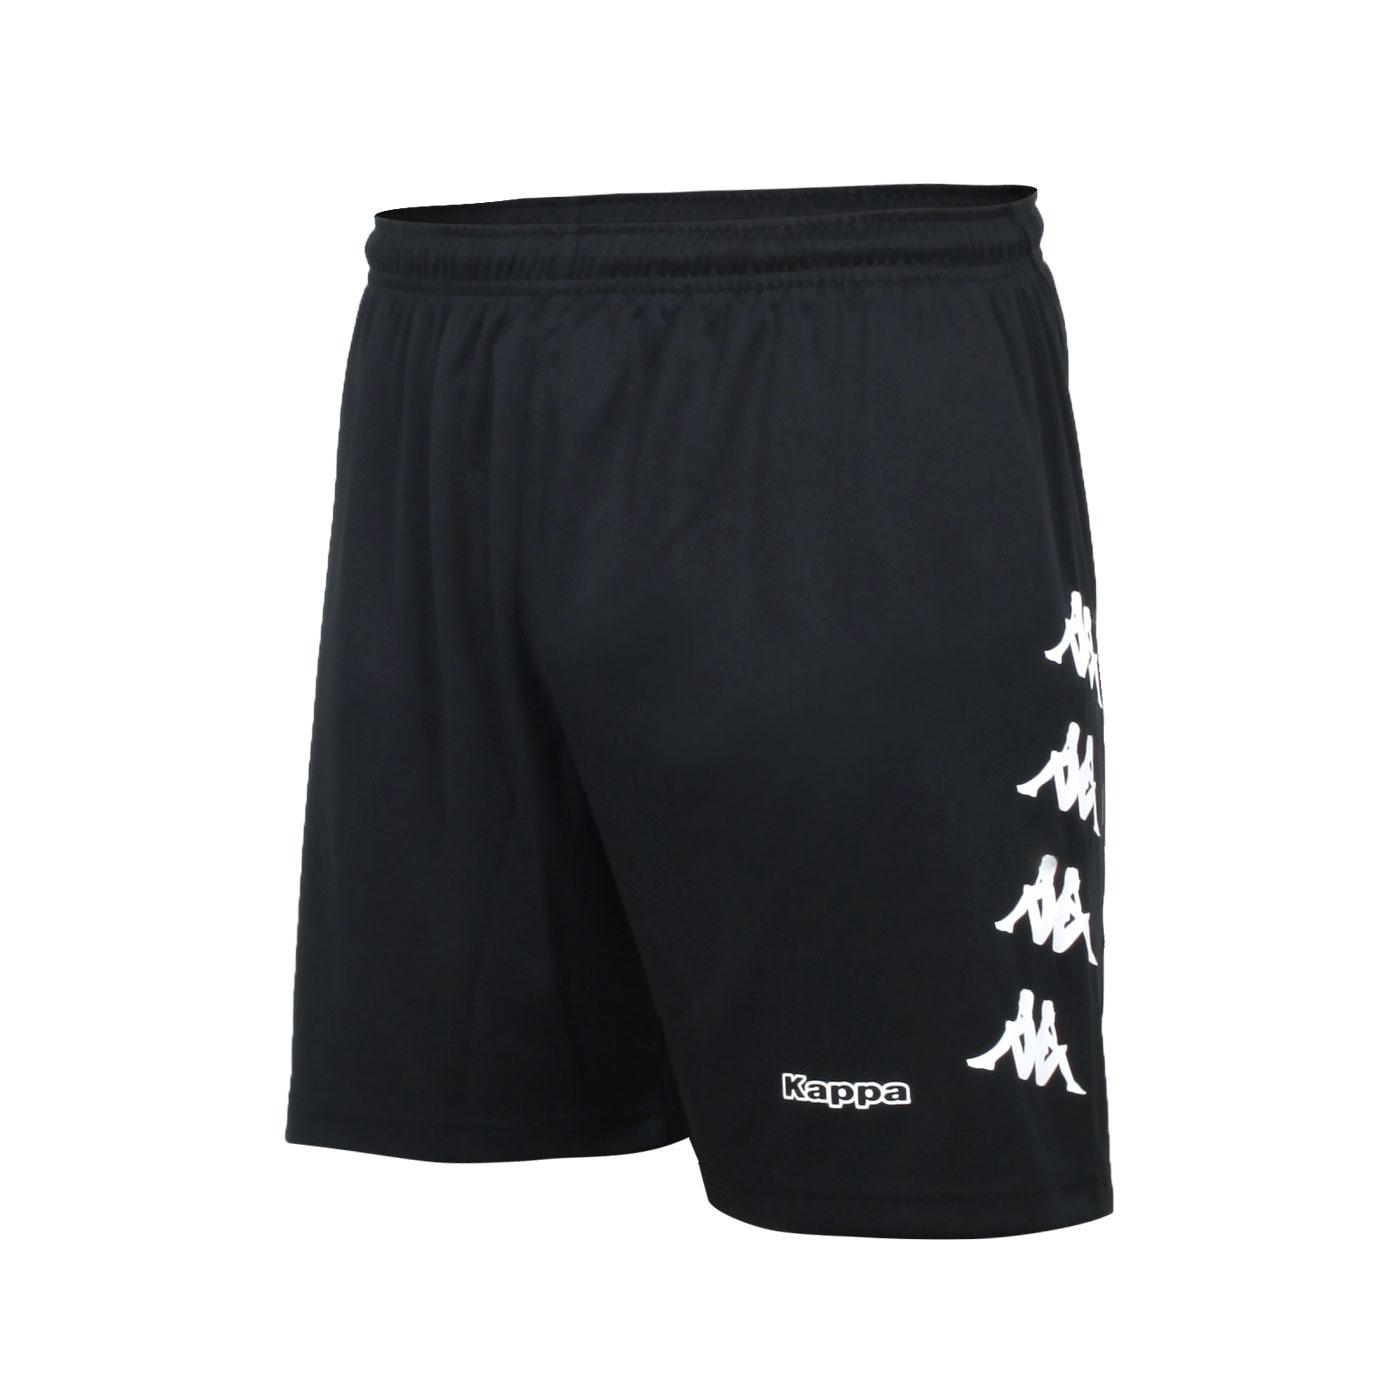 KAPPA 男款K4T運動針織短褲 32166YW-005 - 黑白